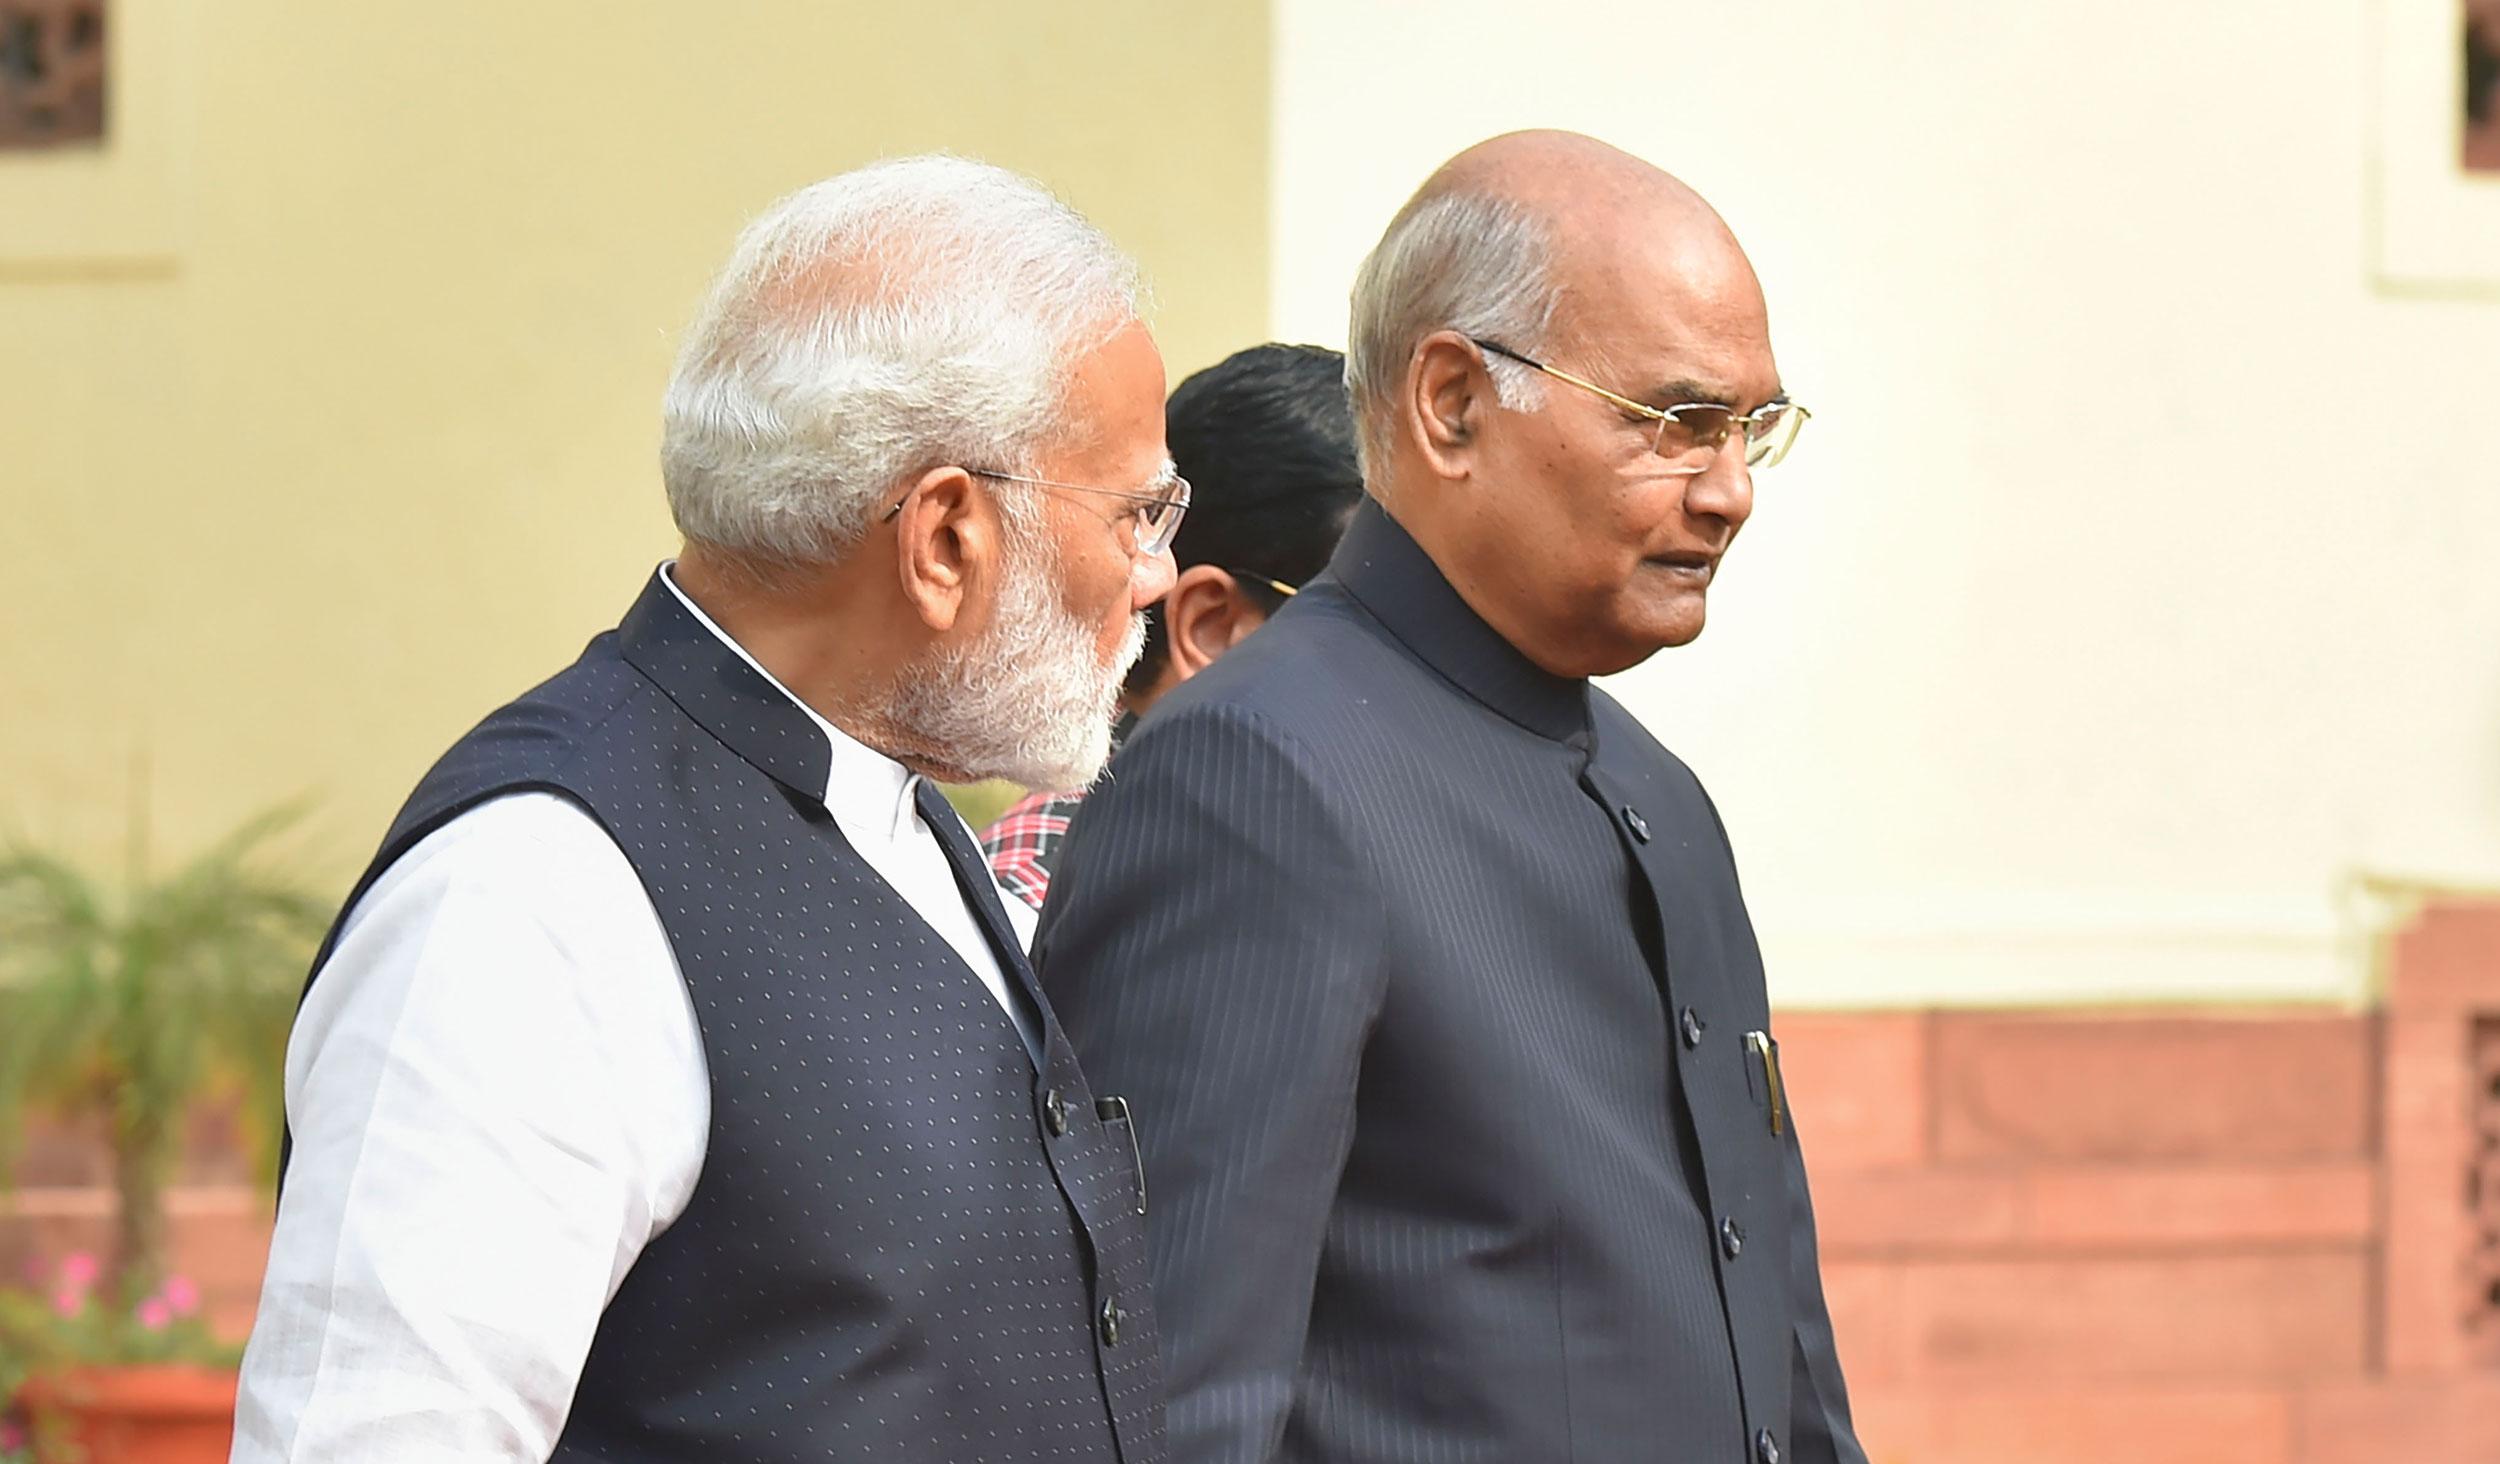 President Ram Nath Kovind and Prime Minister Narendra Modi arrive for a function to commemorate 'Samvidhan Divas' at Parliament, in New Delhi, on November 26, 2019.